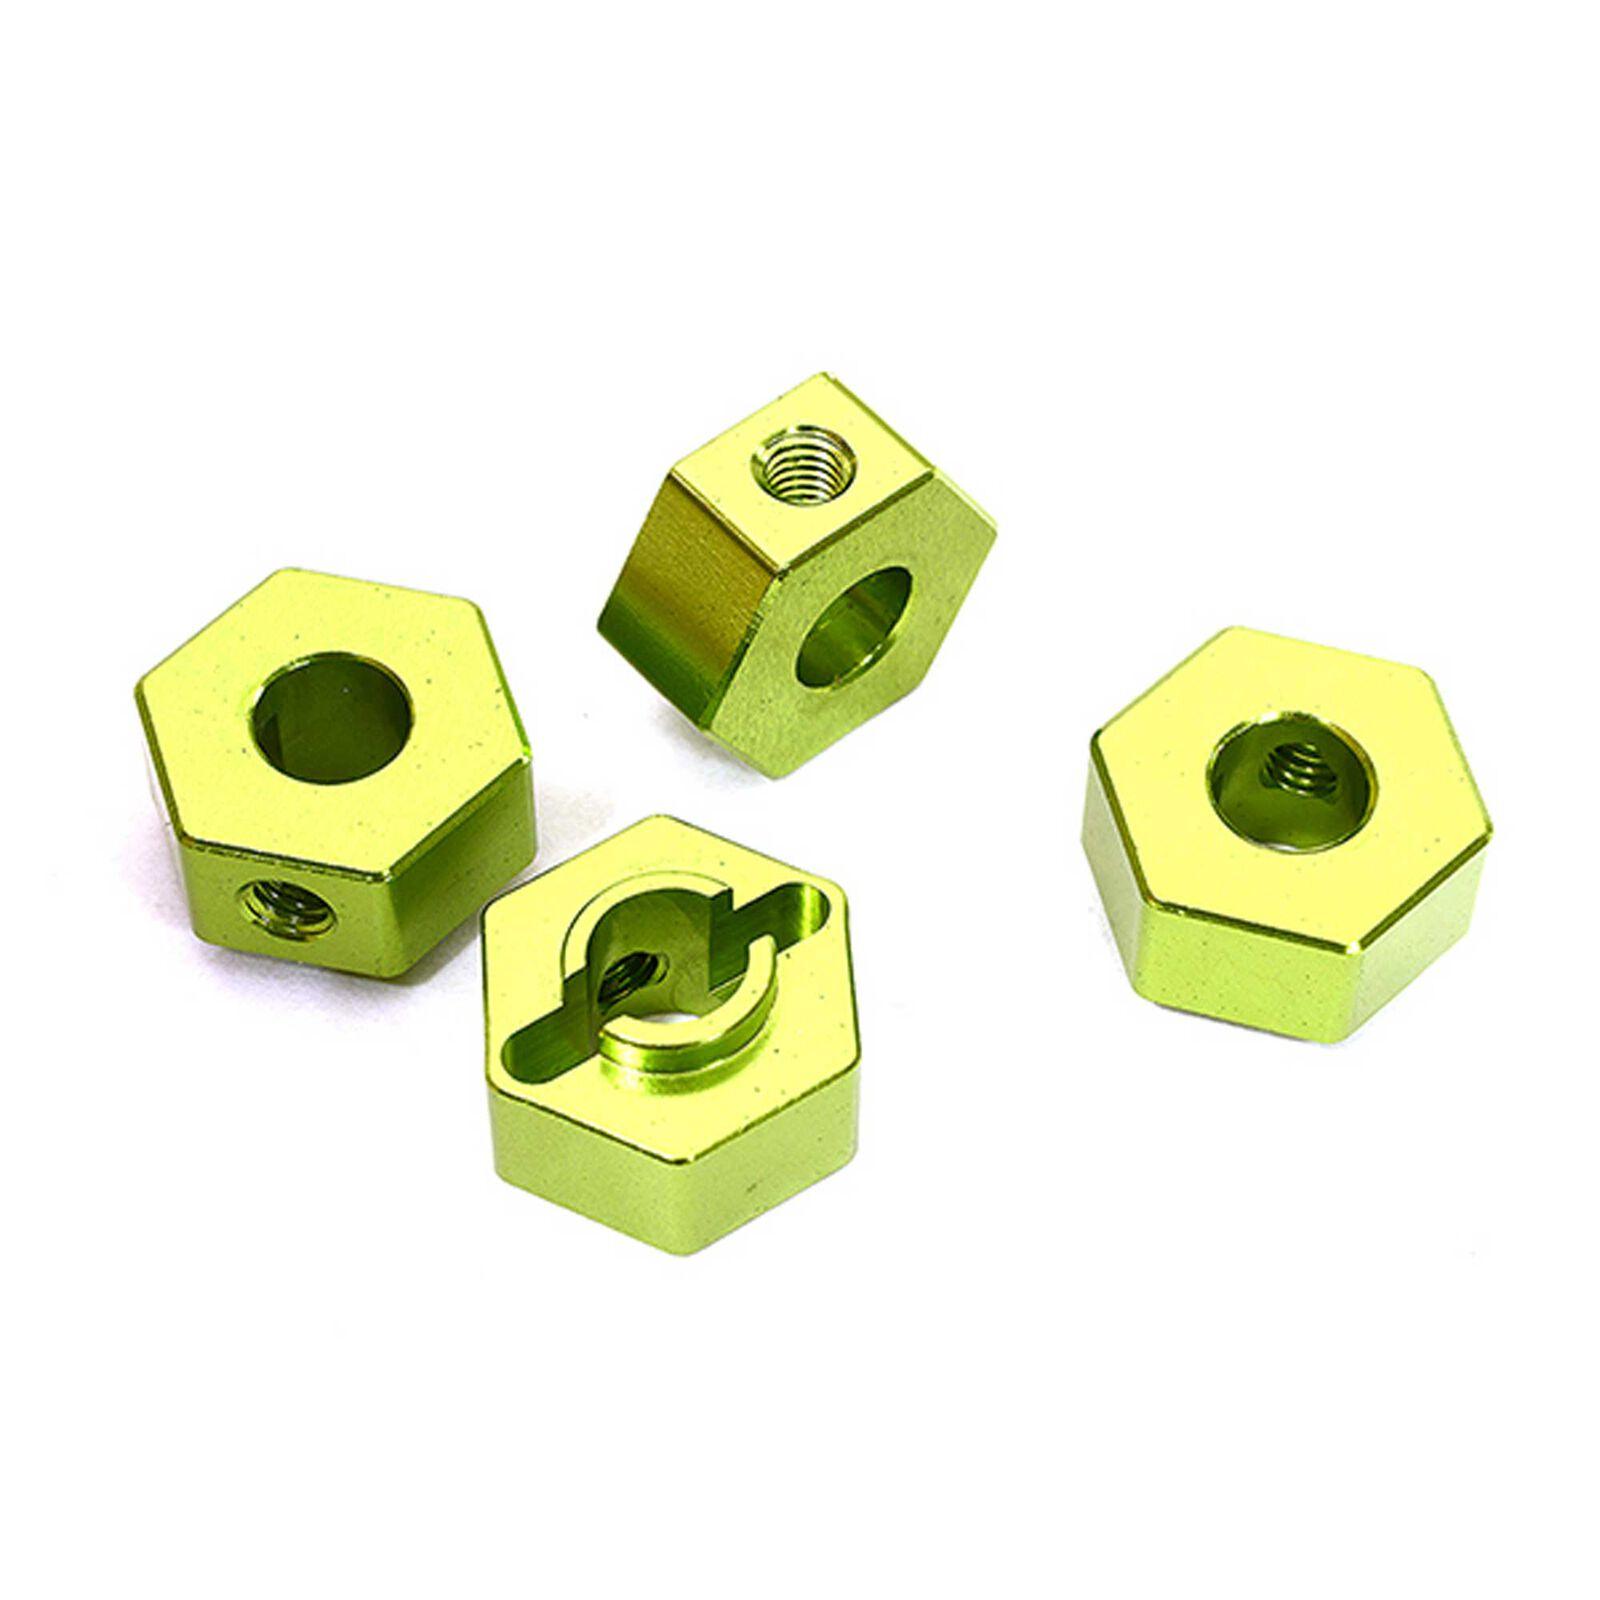 Wheel Hex, Green (4): ARRMA 1/10 GRANITE Voltage